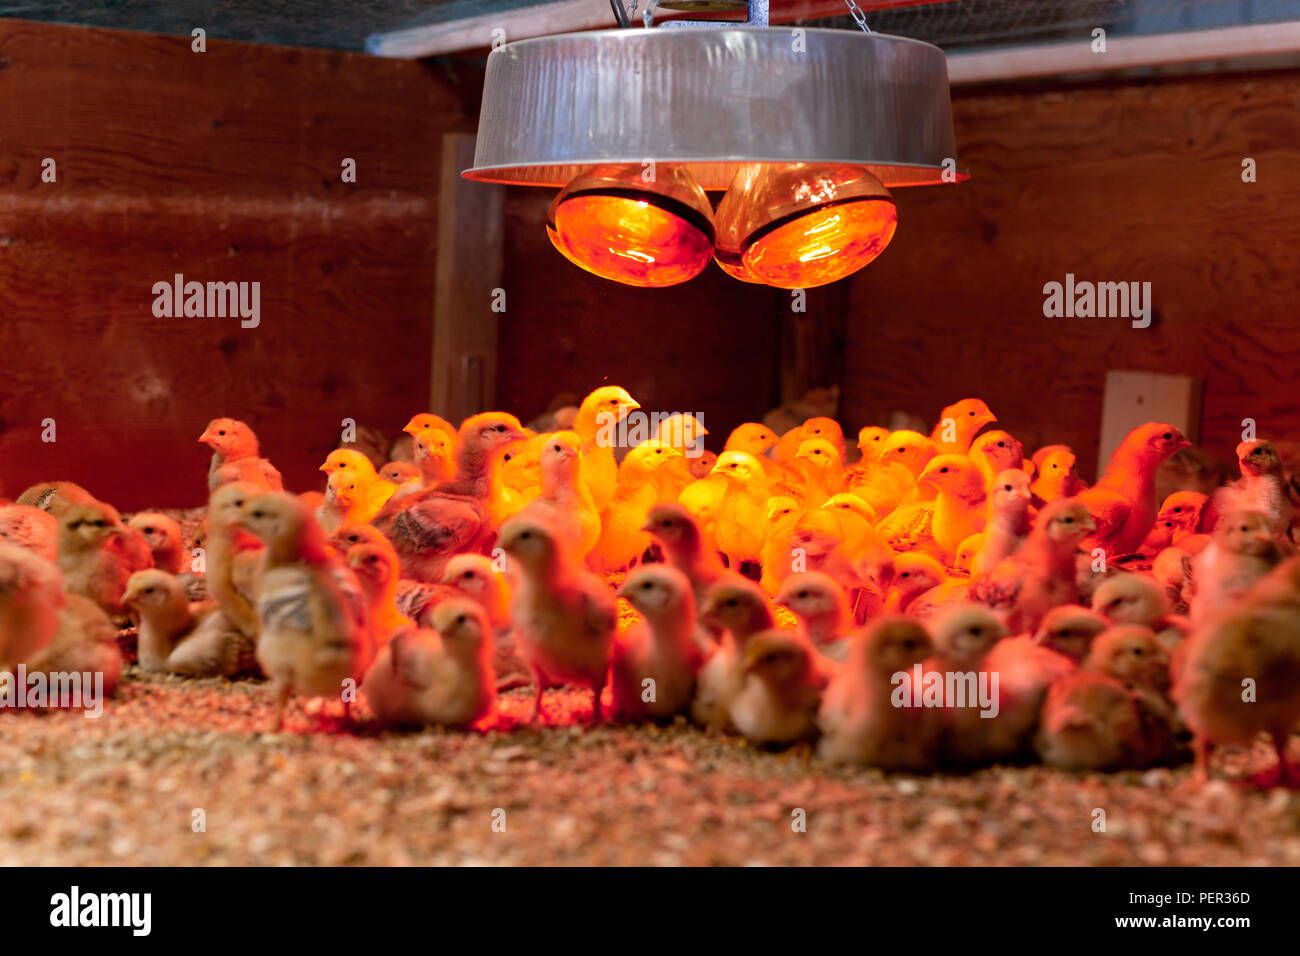 Filmación con poca luz Grupo de pollo en poca luz cálida en incubadora. Foto de stock